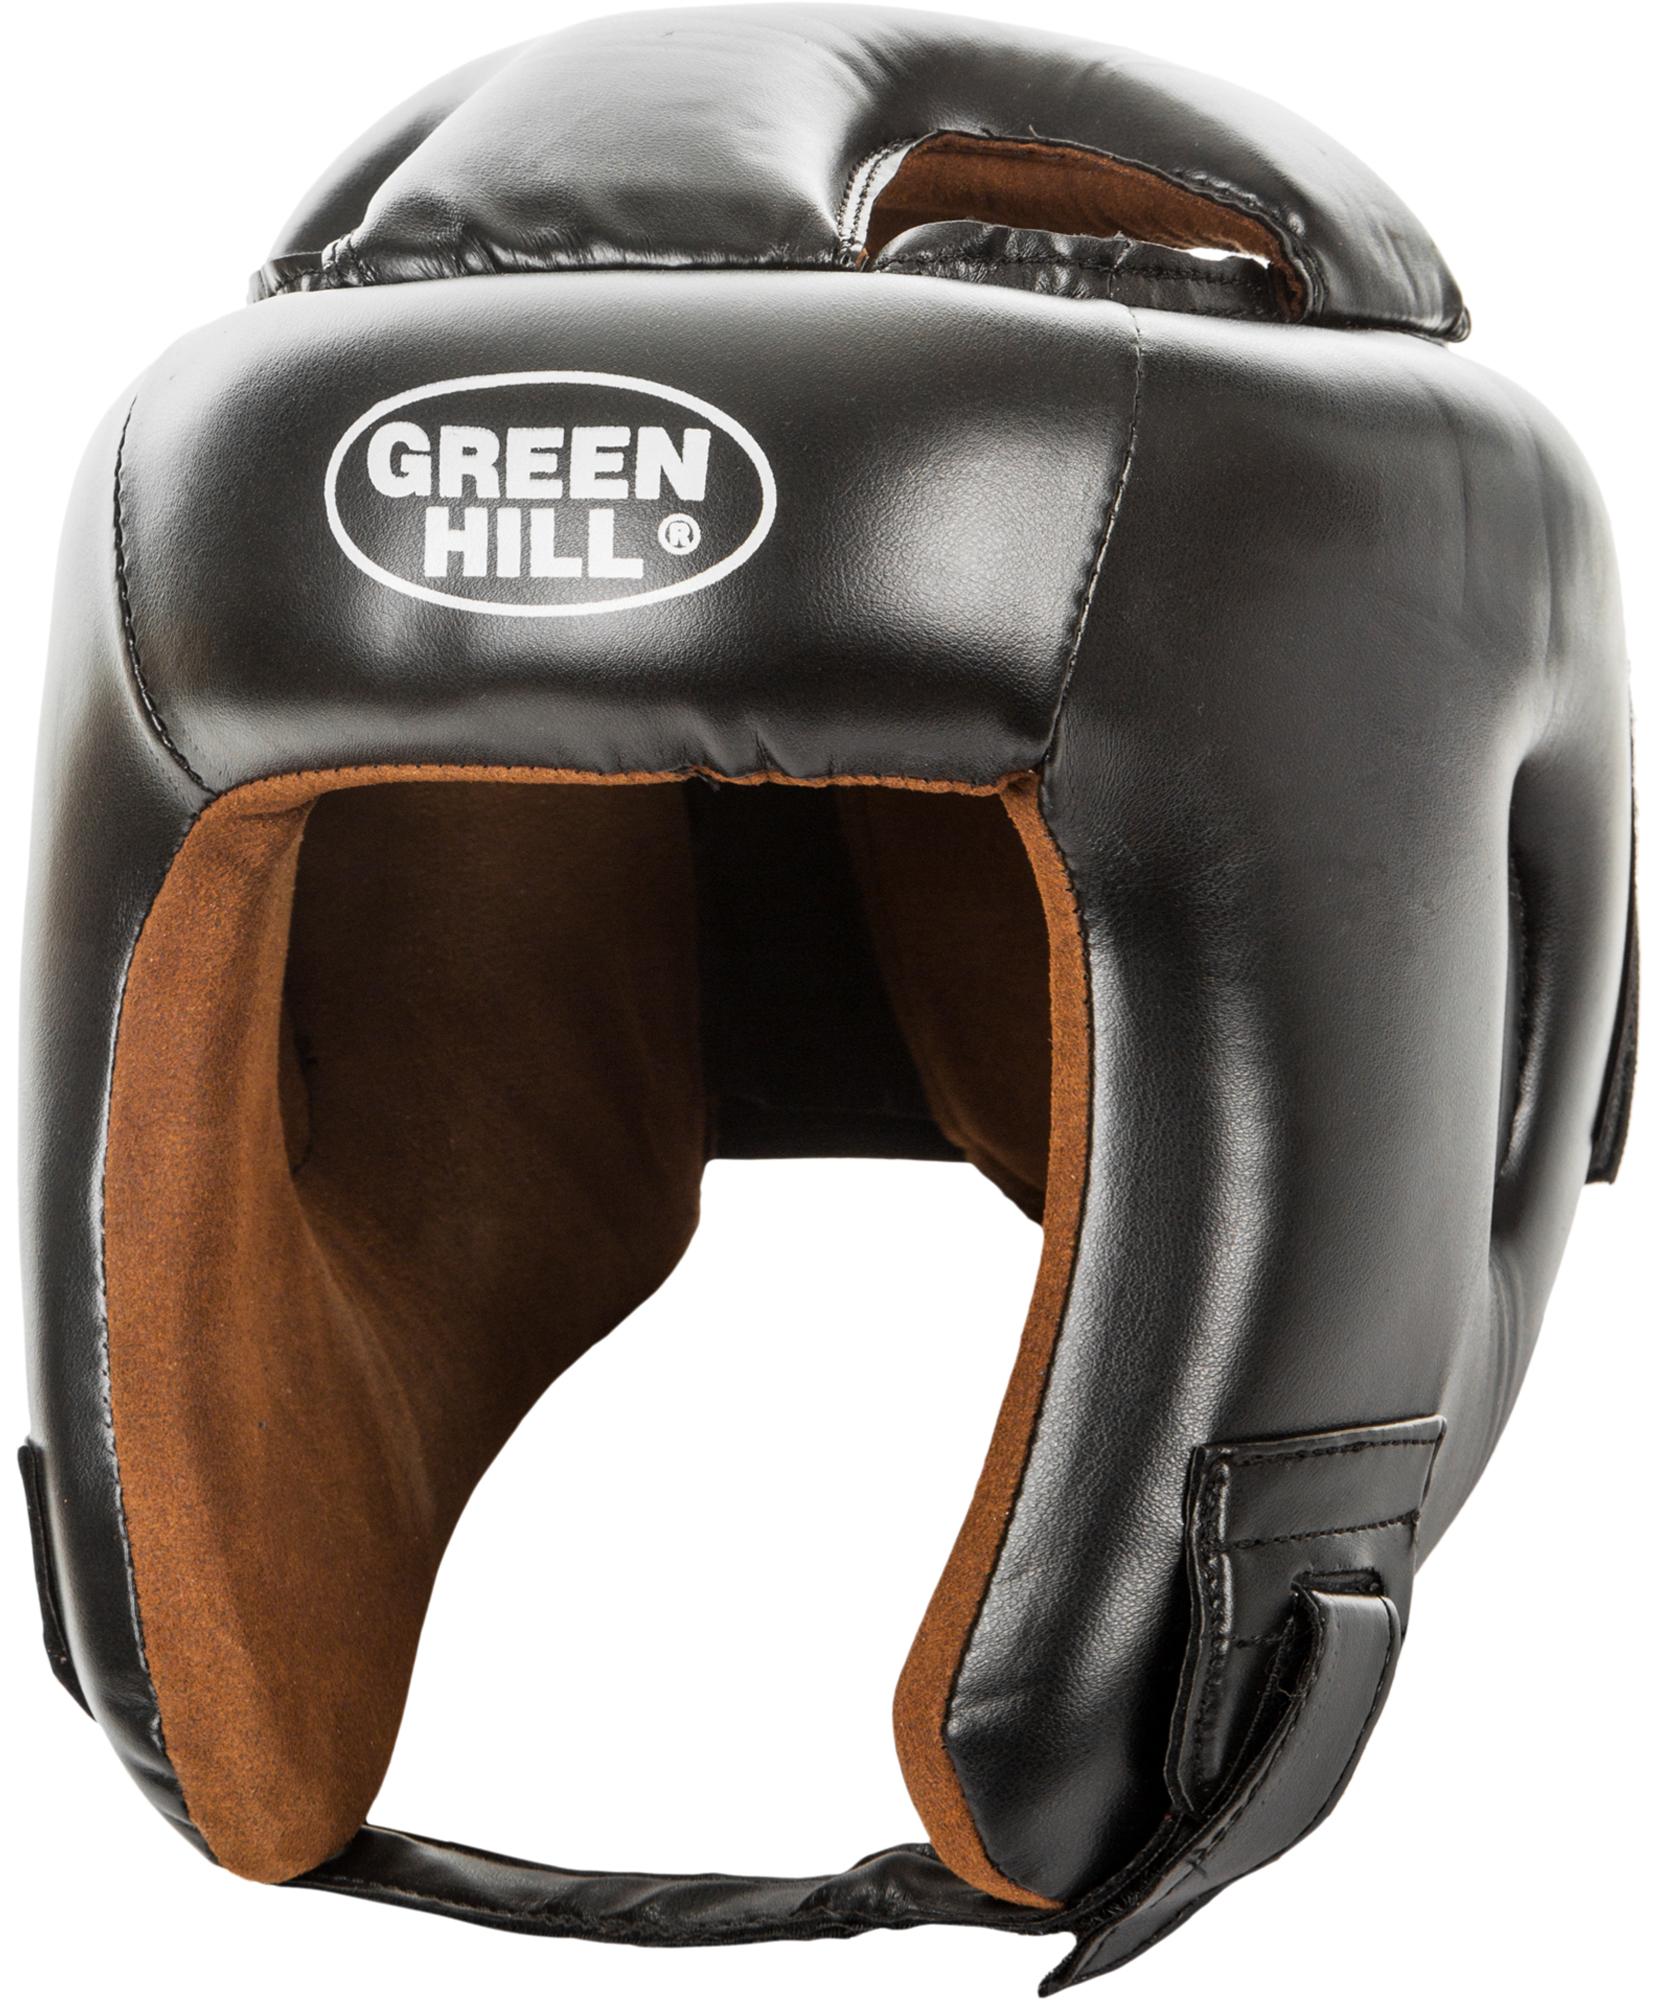 Green Hill Шлем Green Hill Headgear пояс для кикбоксинга green hill kbb 1015 7 contact 200 см